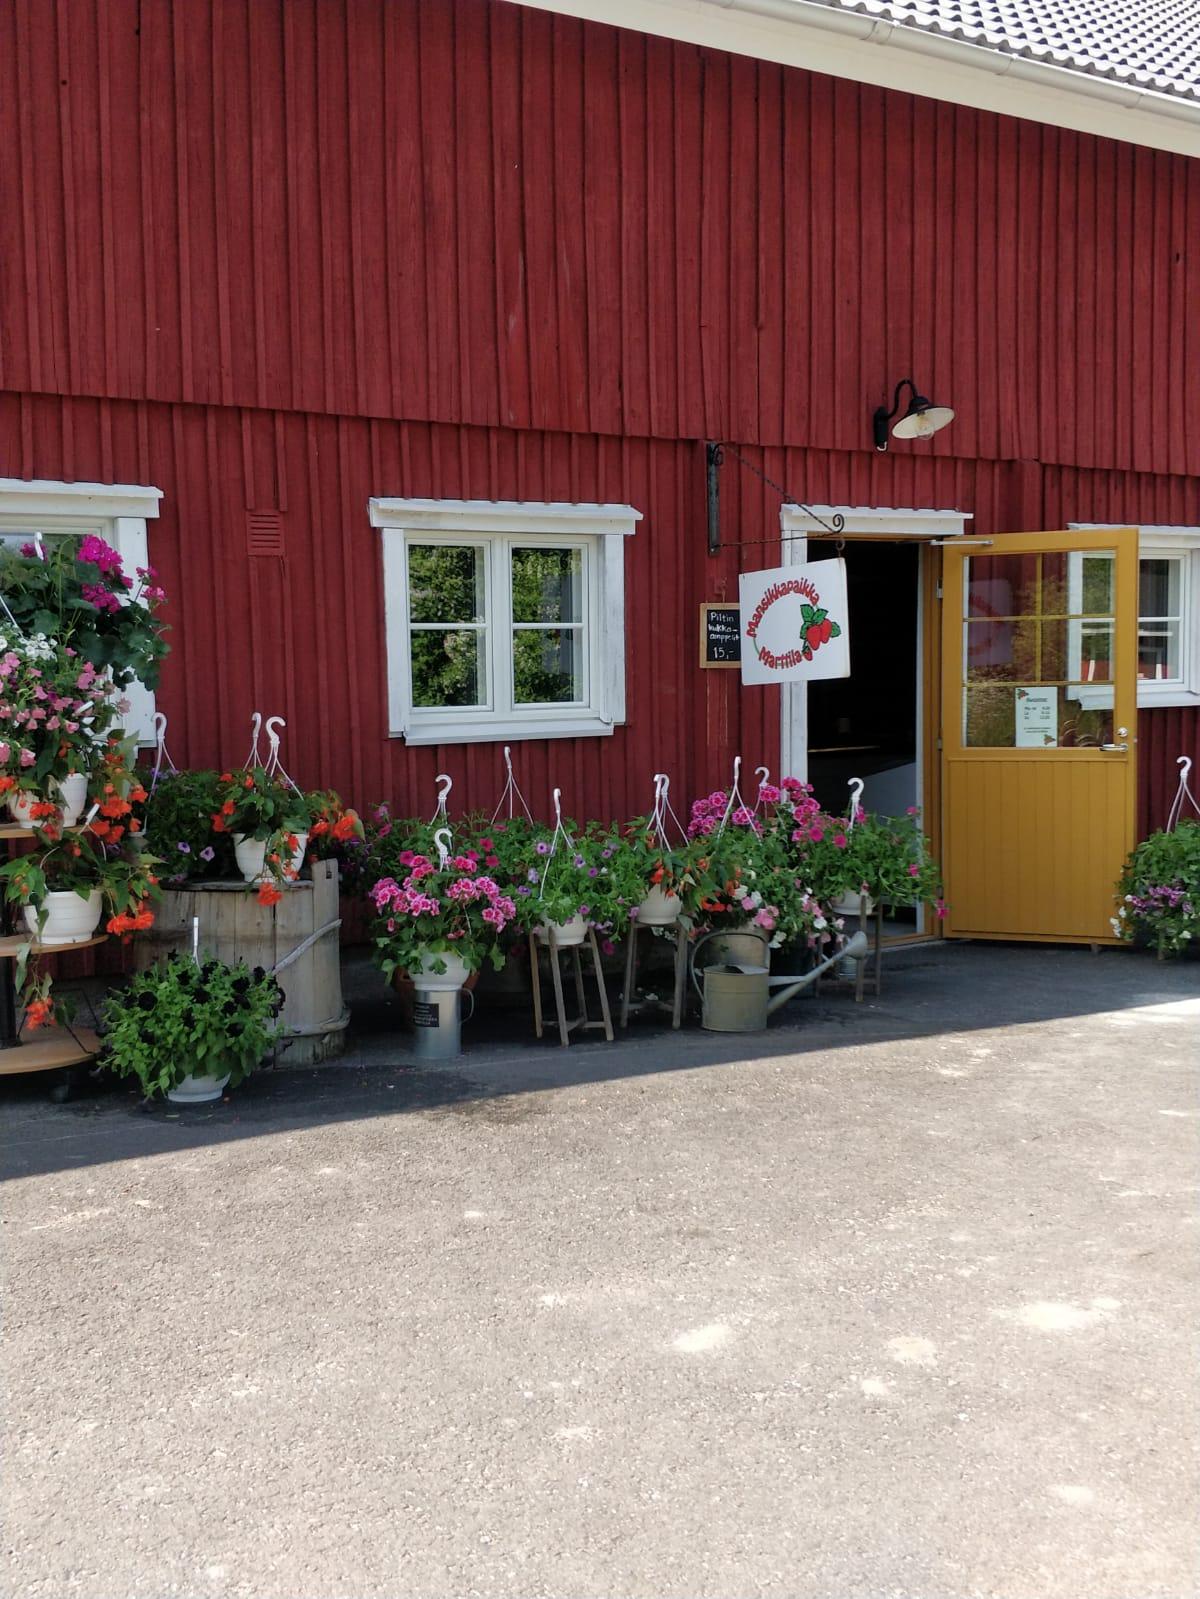 Mansikkapaikka Marttila (strawberry place)